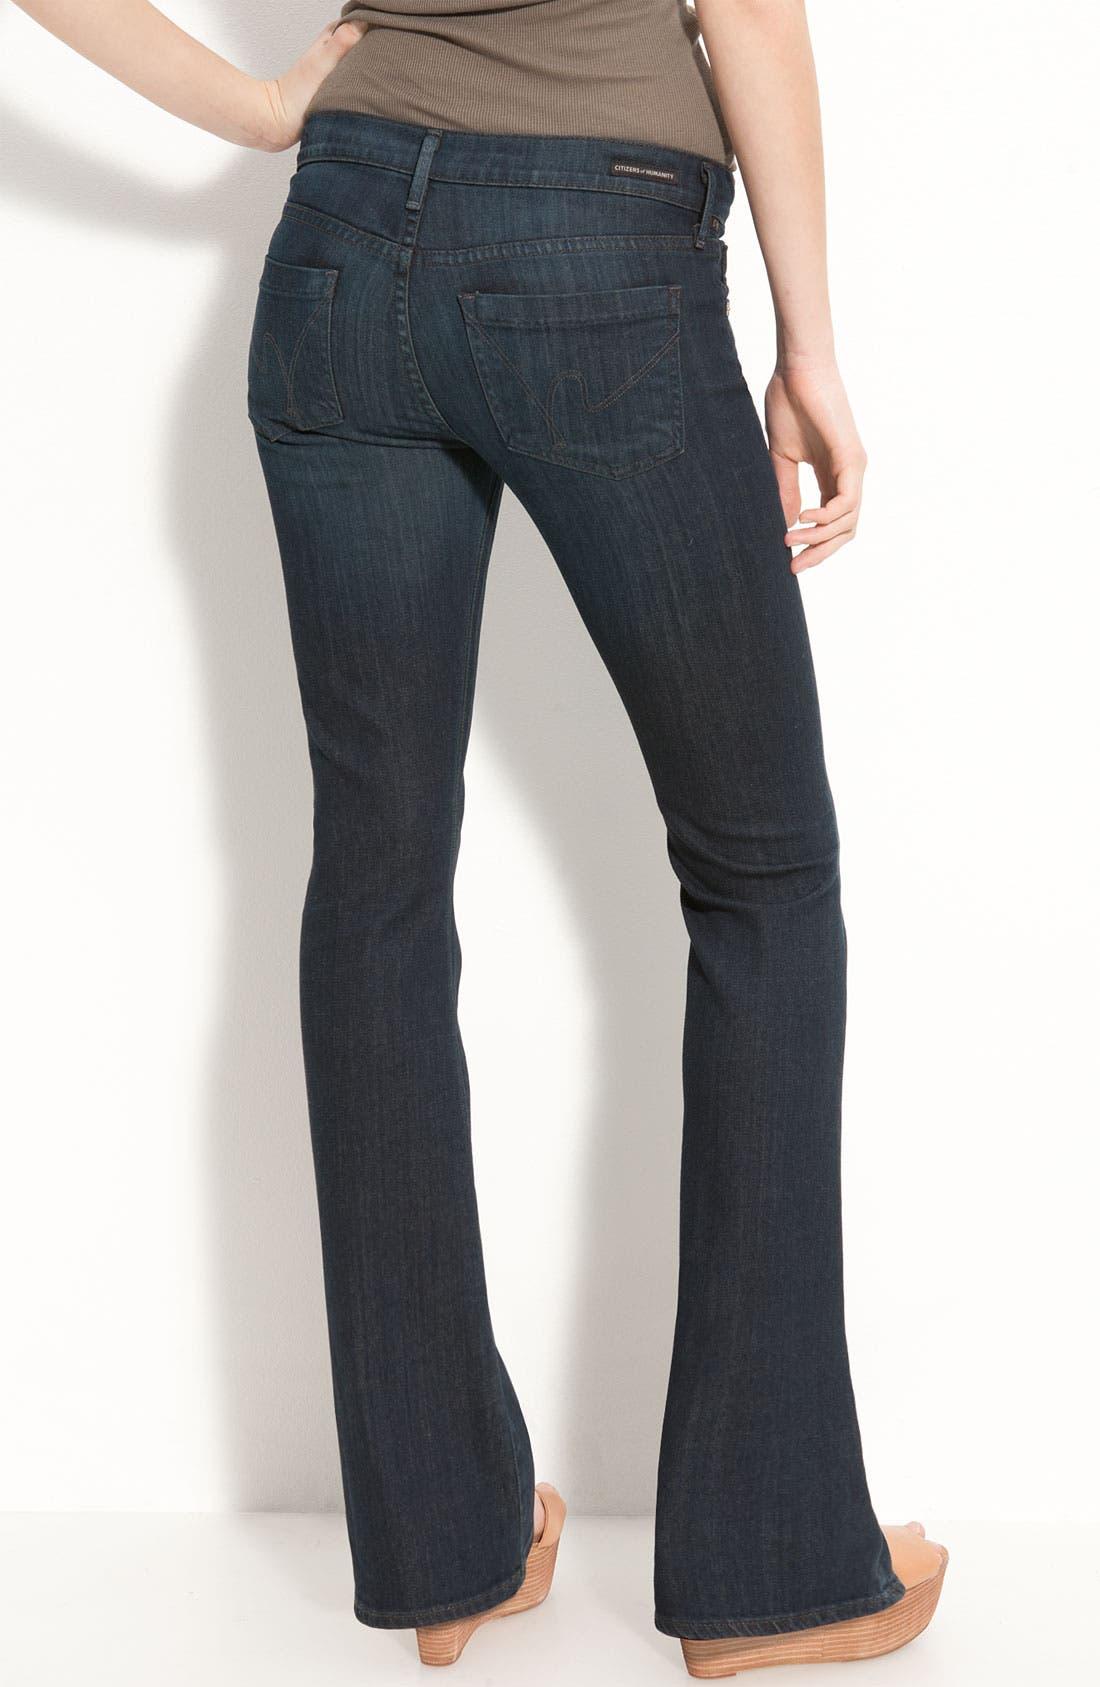 Alternate Image 1 Selected - Citizens of Humanity 'Dita' Bootcut Jeans (Jupiter Wash) (Petite)